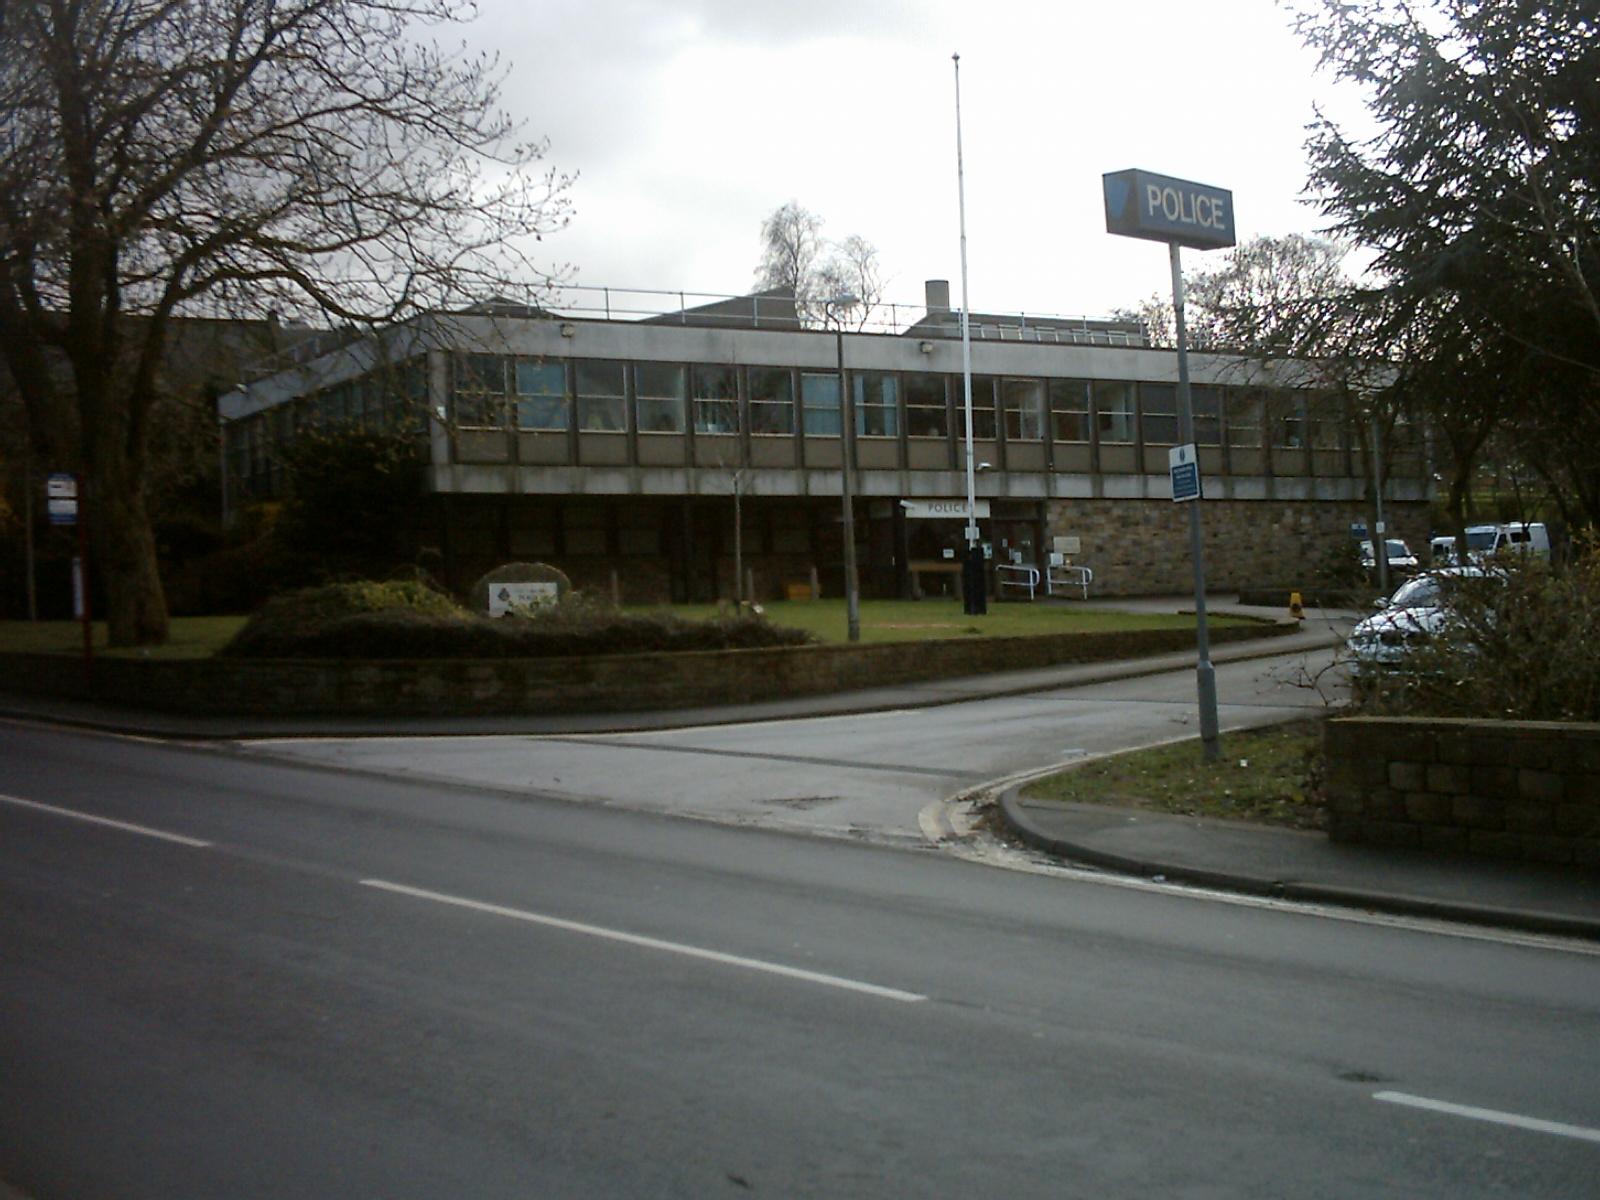 Otley Police Station